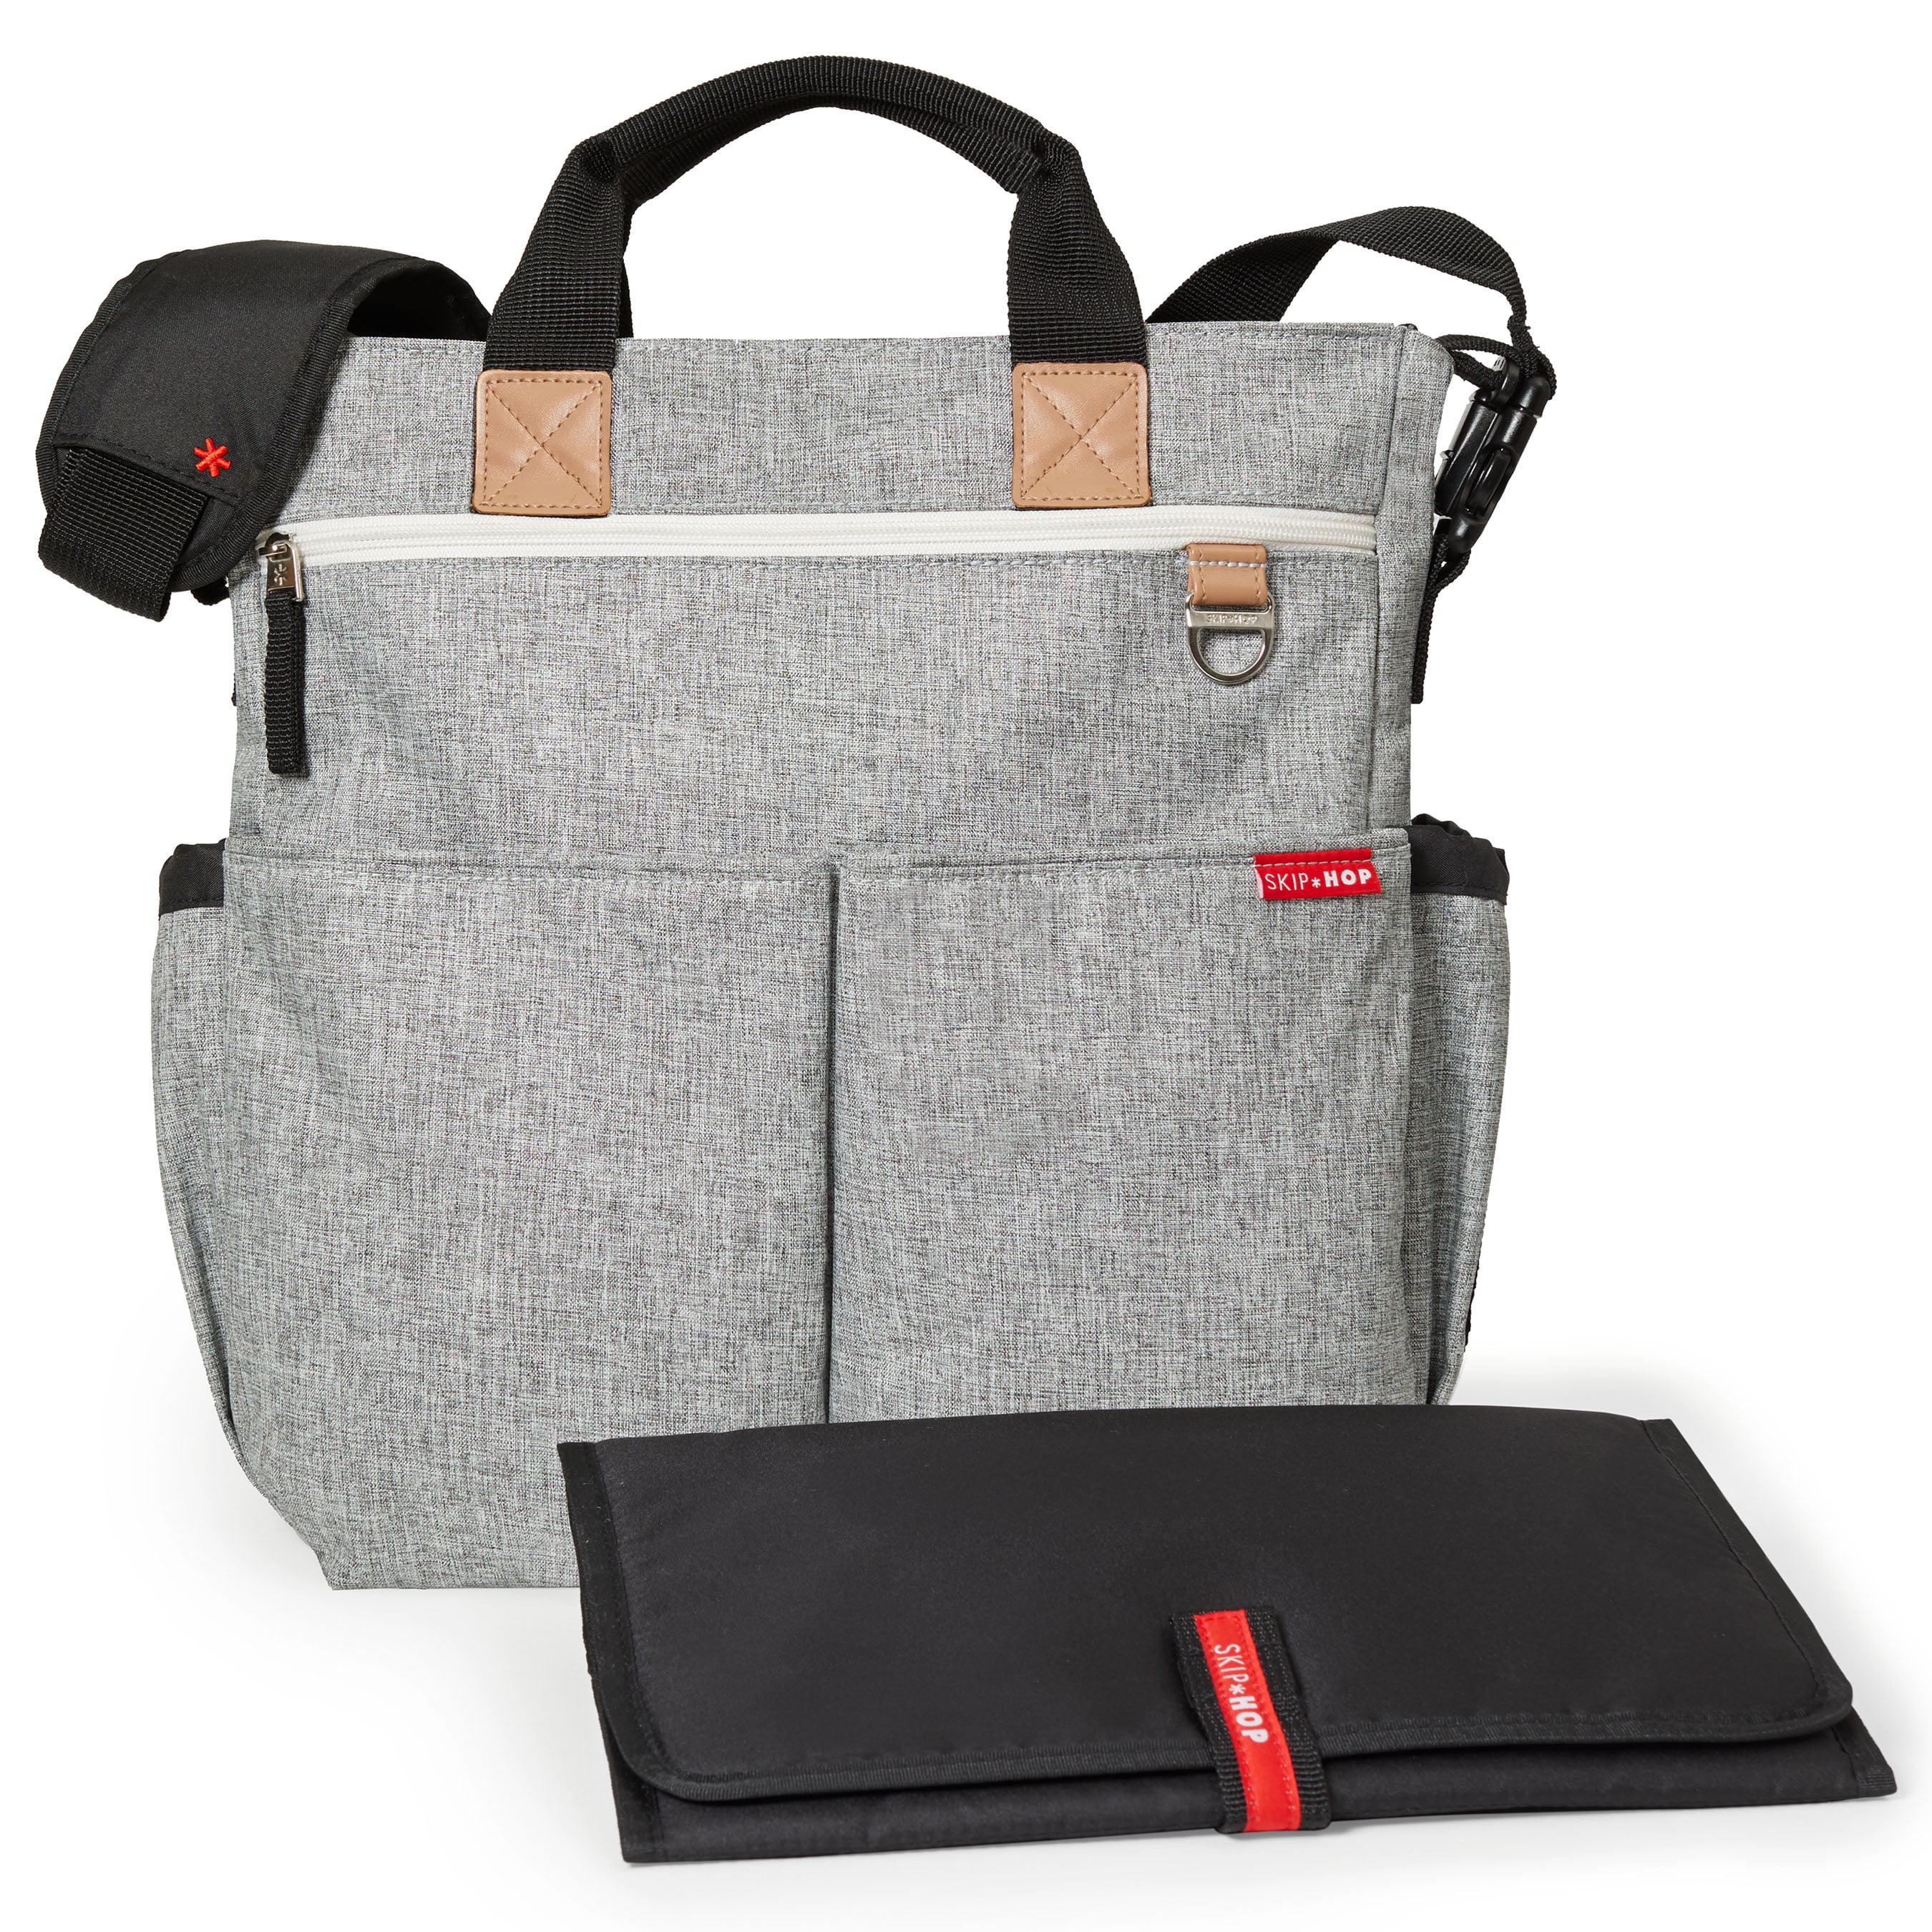 Skip Hop Duo Signature Diaper Bag, Grey Melange by Skip Hop